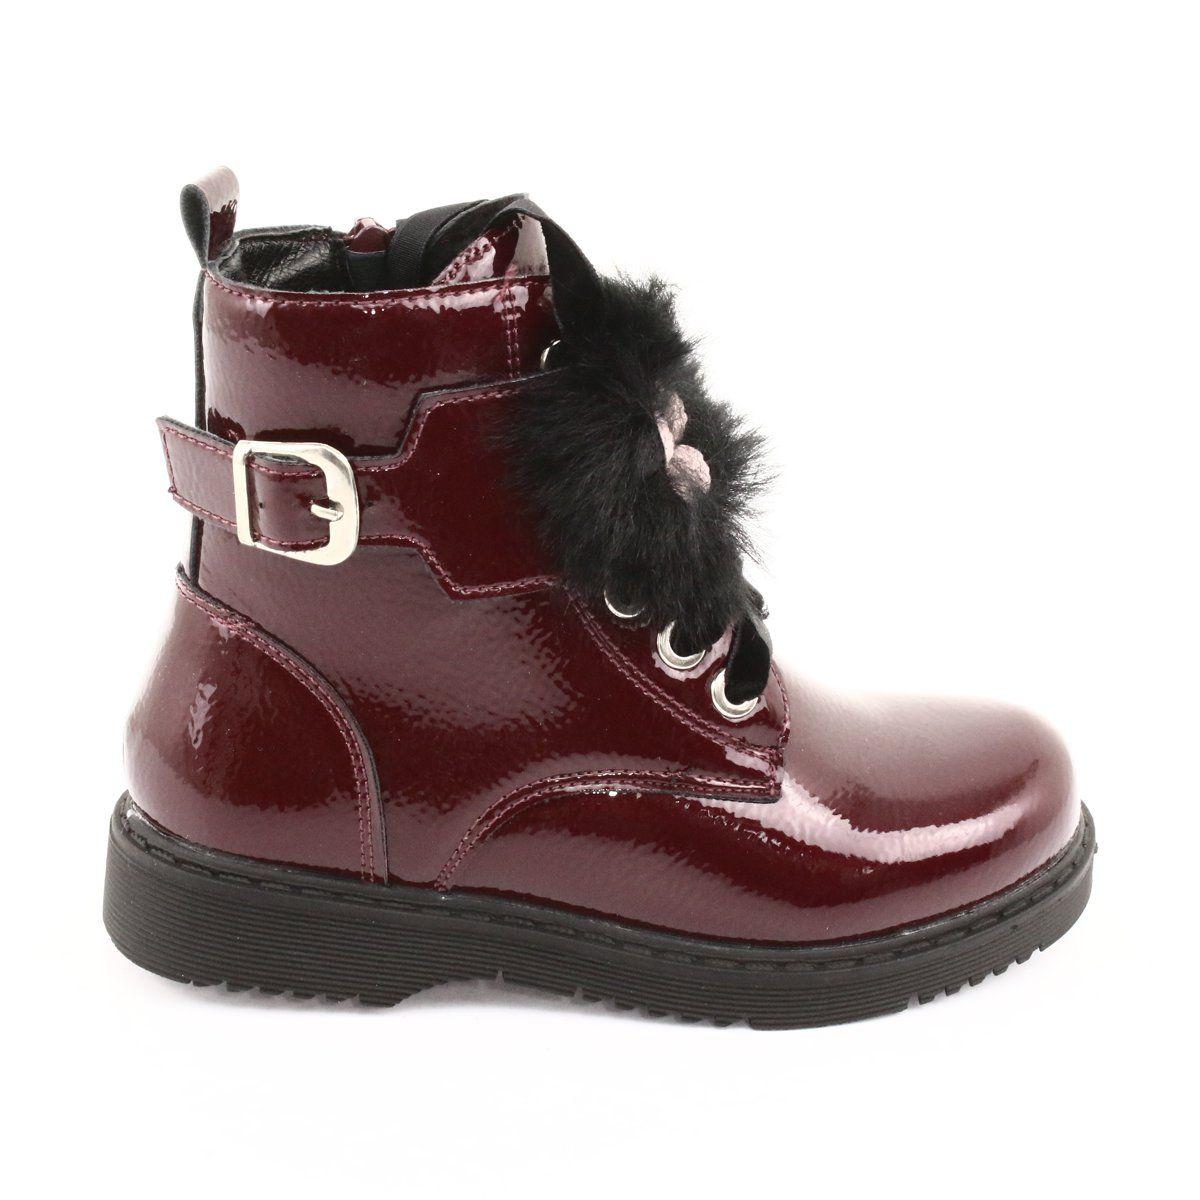 Glany Lakierowane Puszek Evento 1438 Czarne Czerwone Wielokolorowe Boots Childrens Boots Comfort Shoes Women